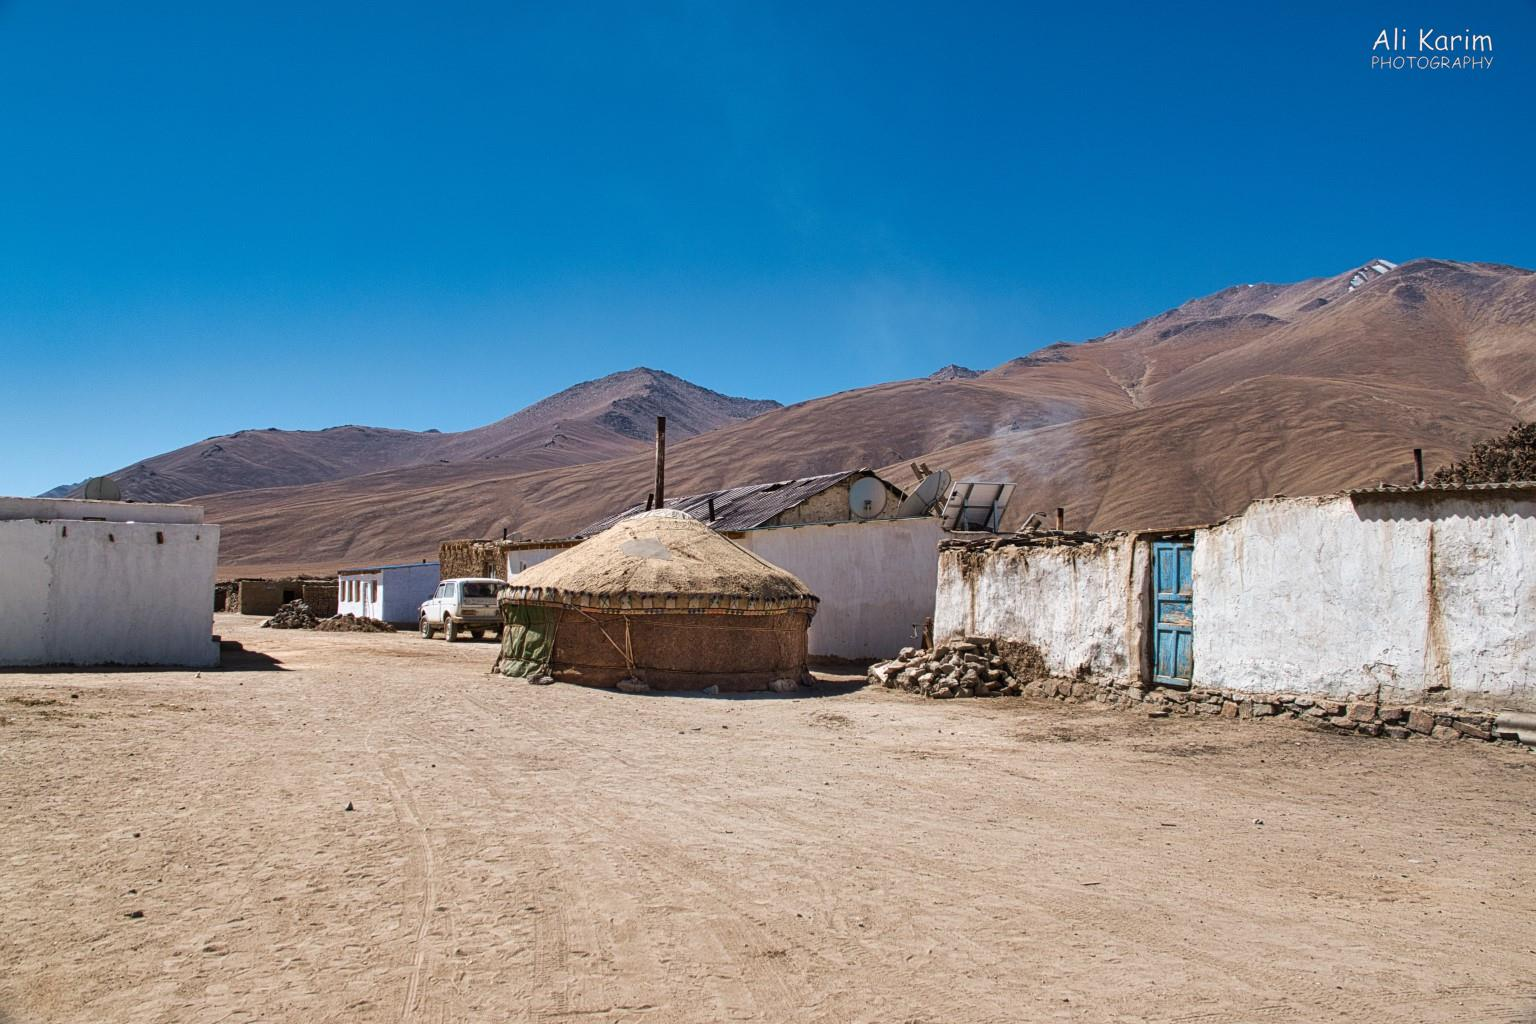 Langar, Tajikistan, Bulunkul village